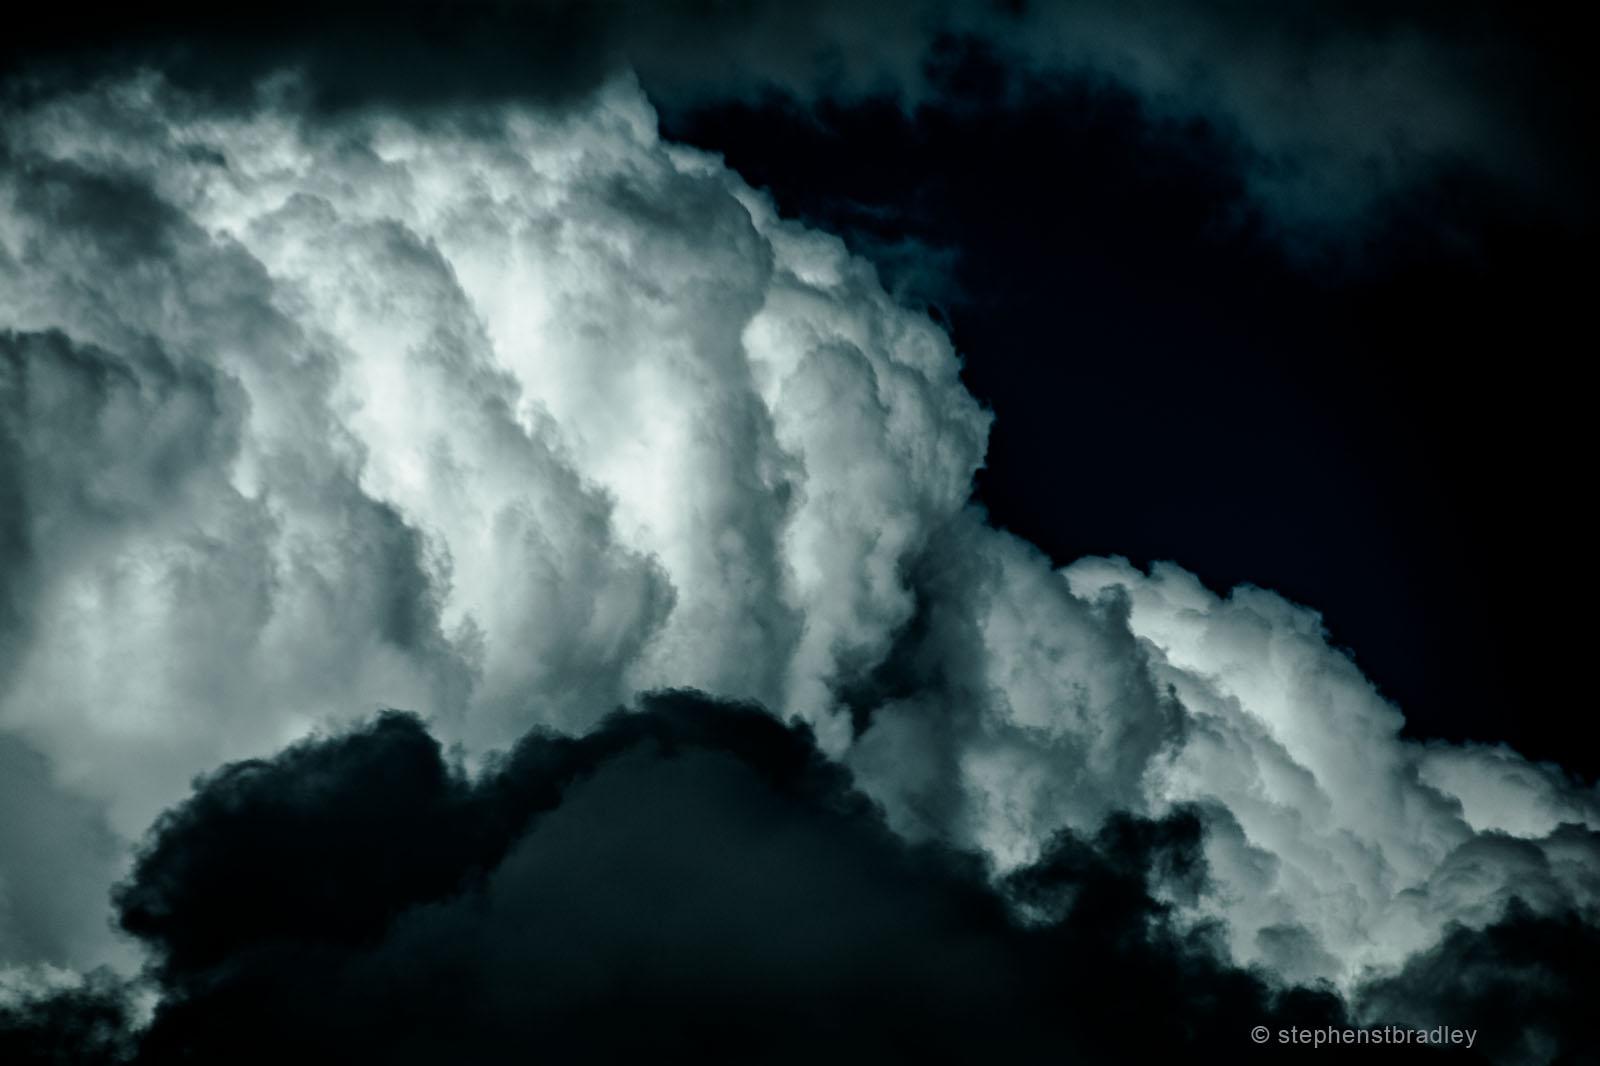 Black Matter 3 - fine art landscape photo 6384 by Stephen S T Bradley.